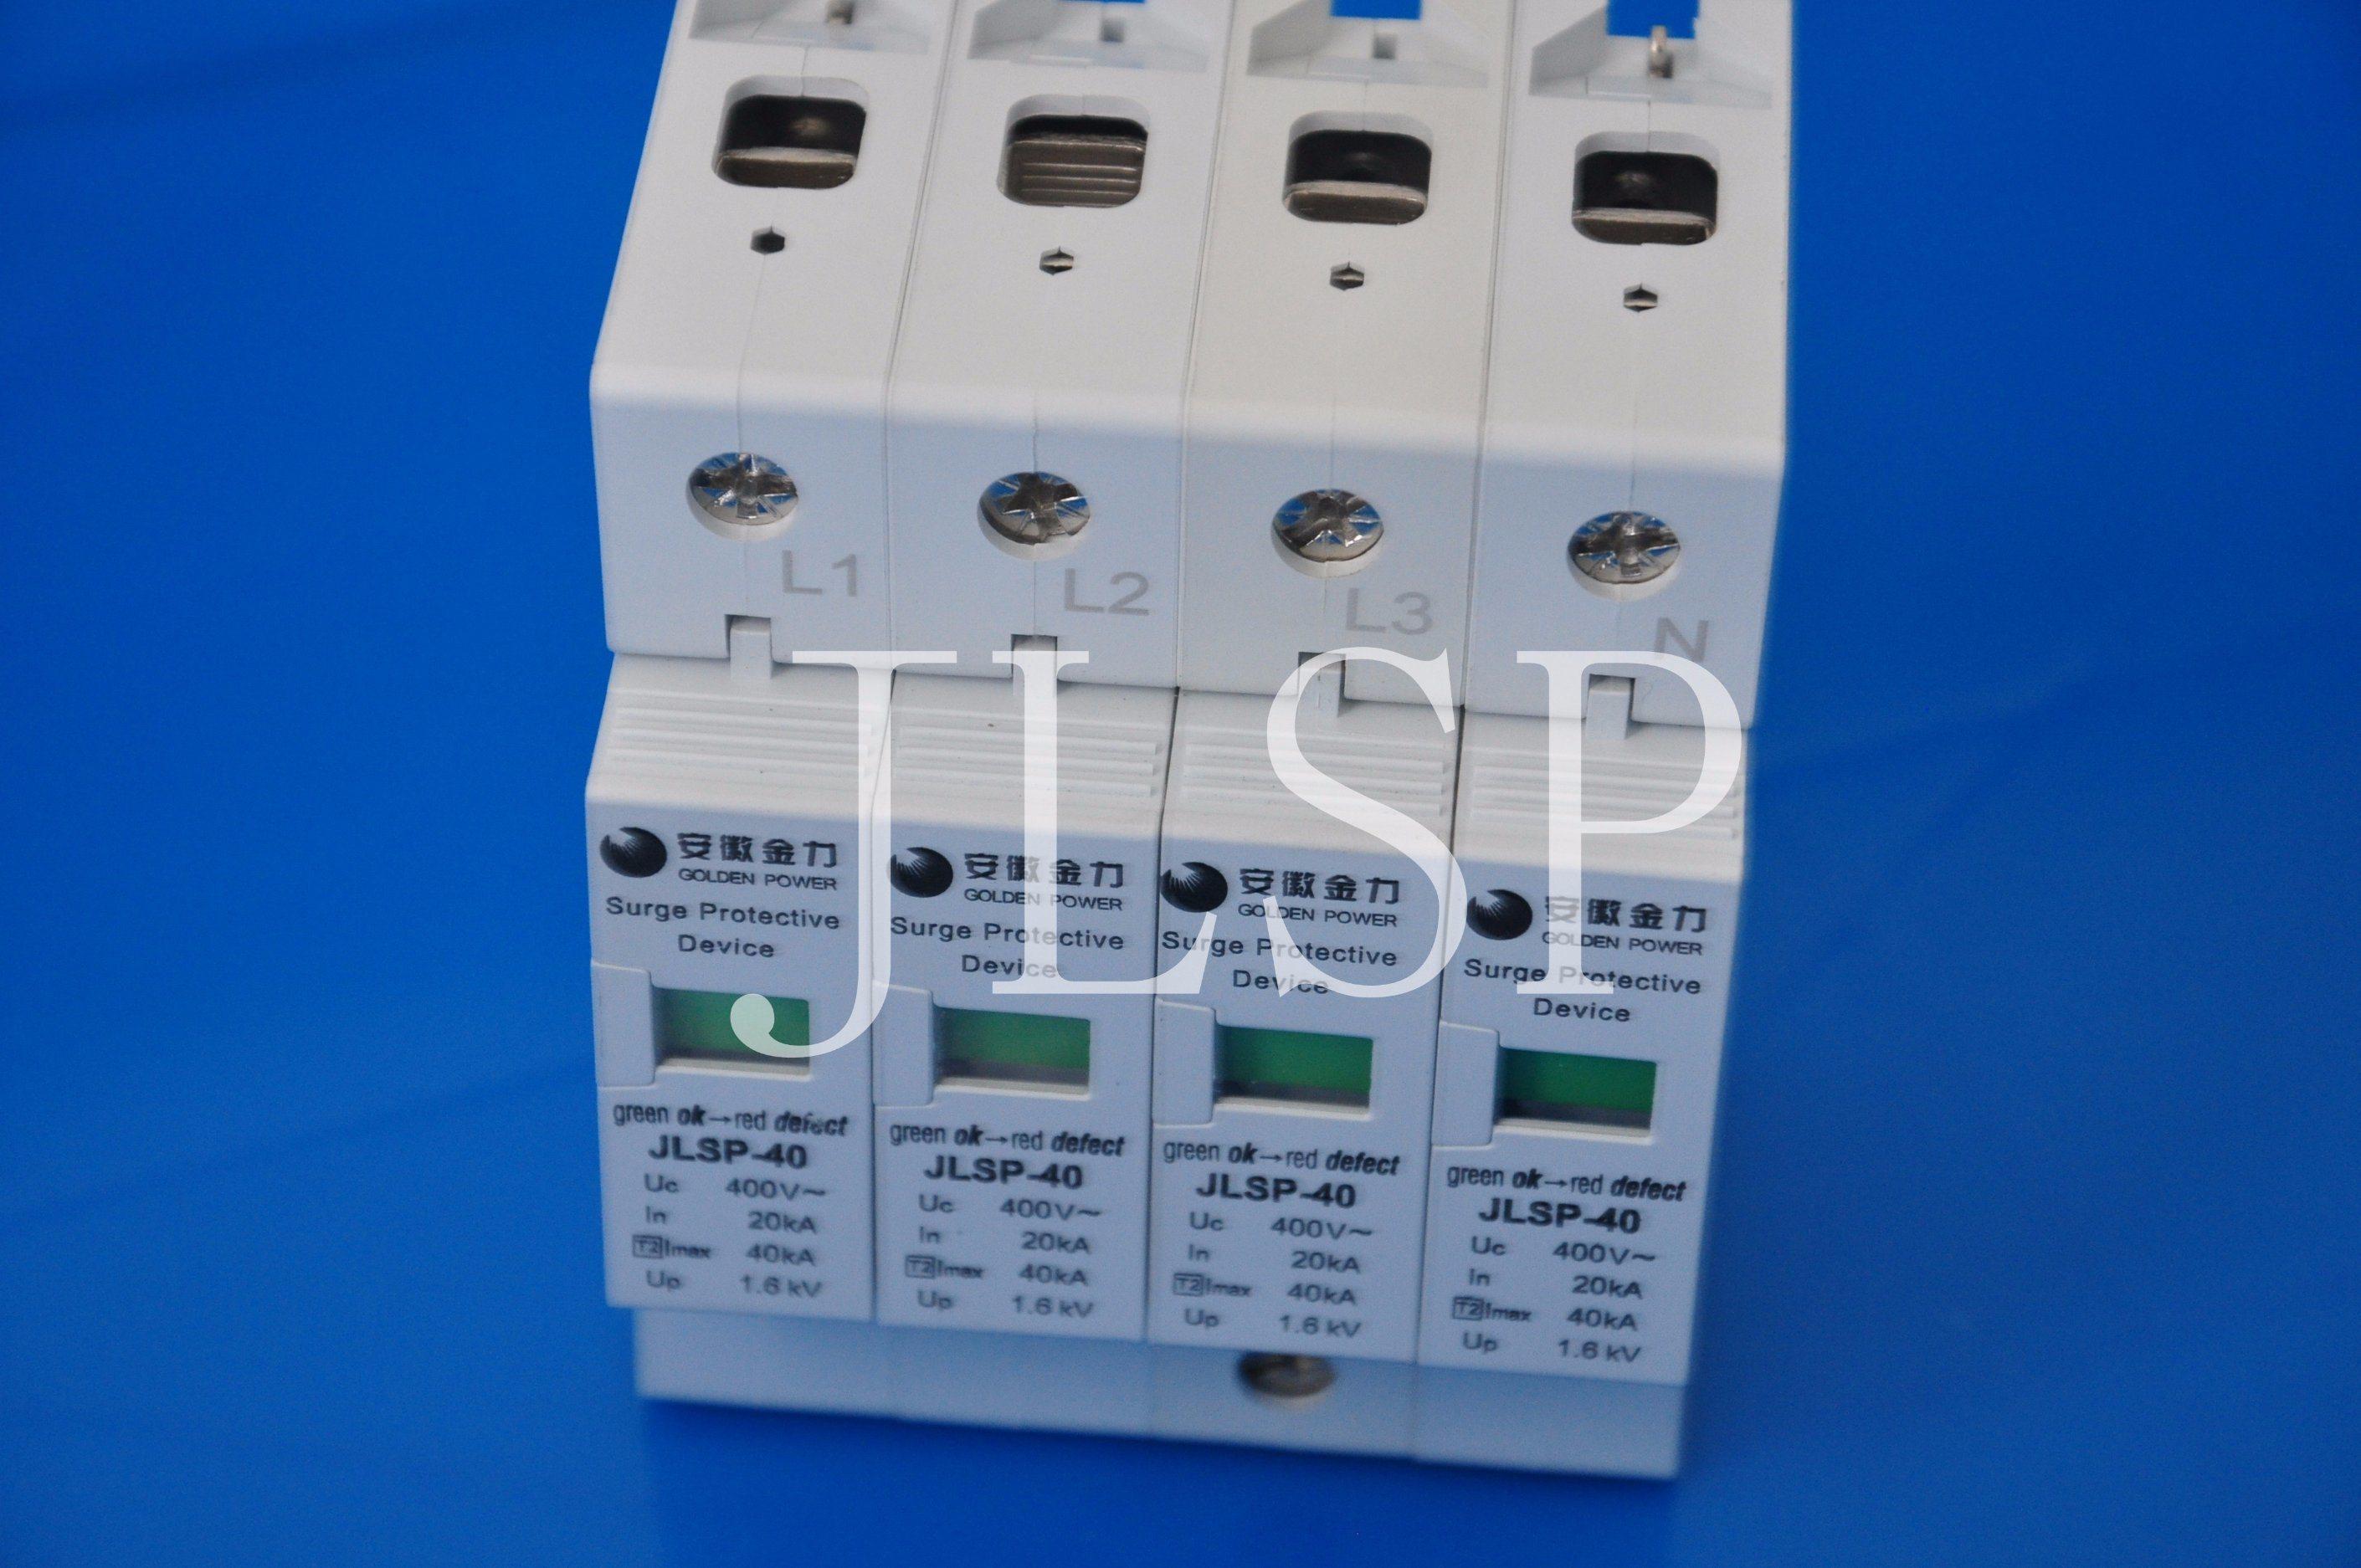 Surge Protective Device 20ka 230/400V, Jlsp-400-40, SPD, 17022